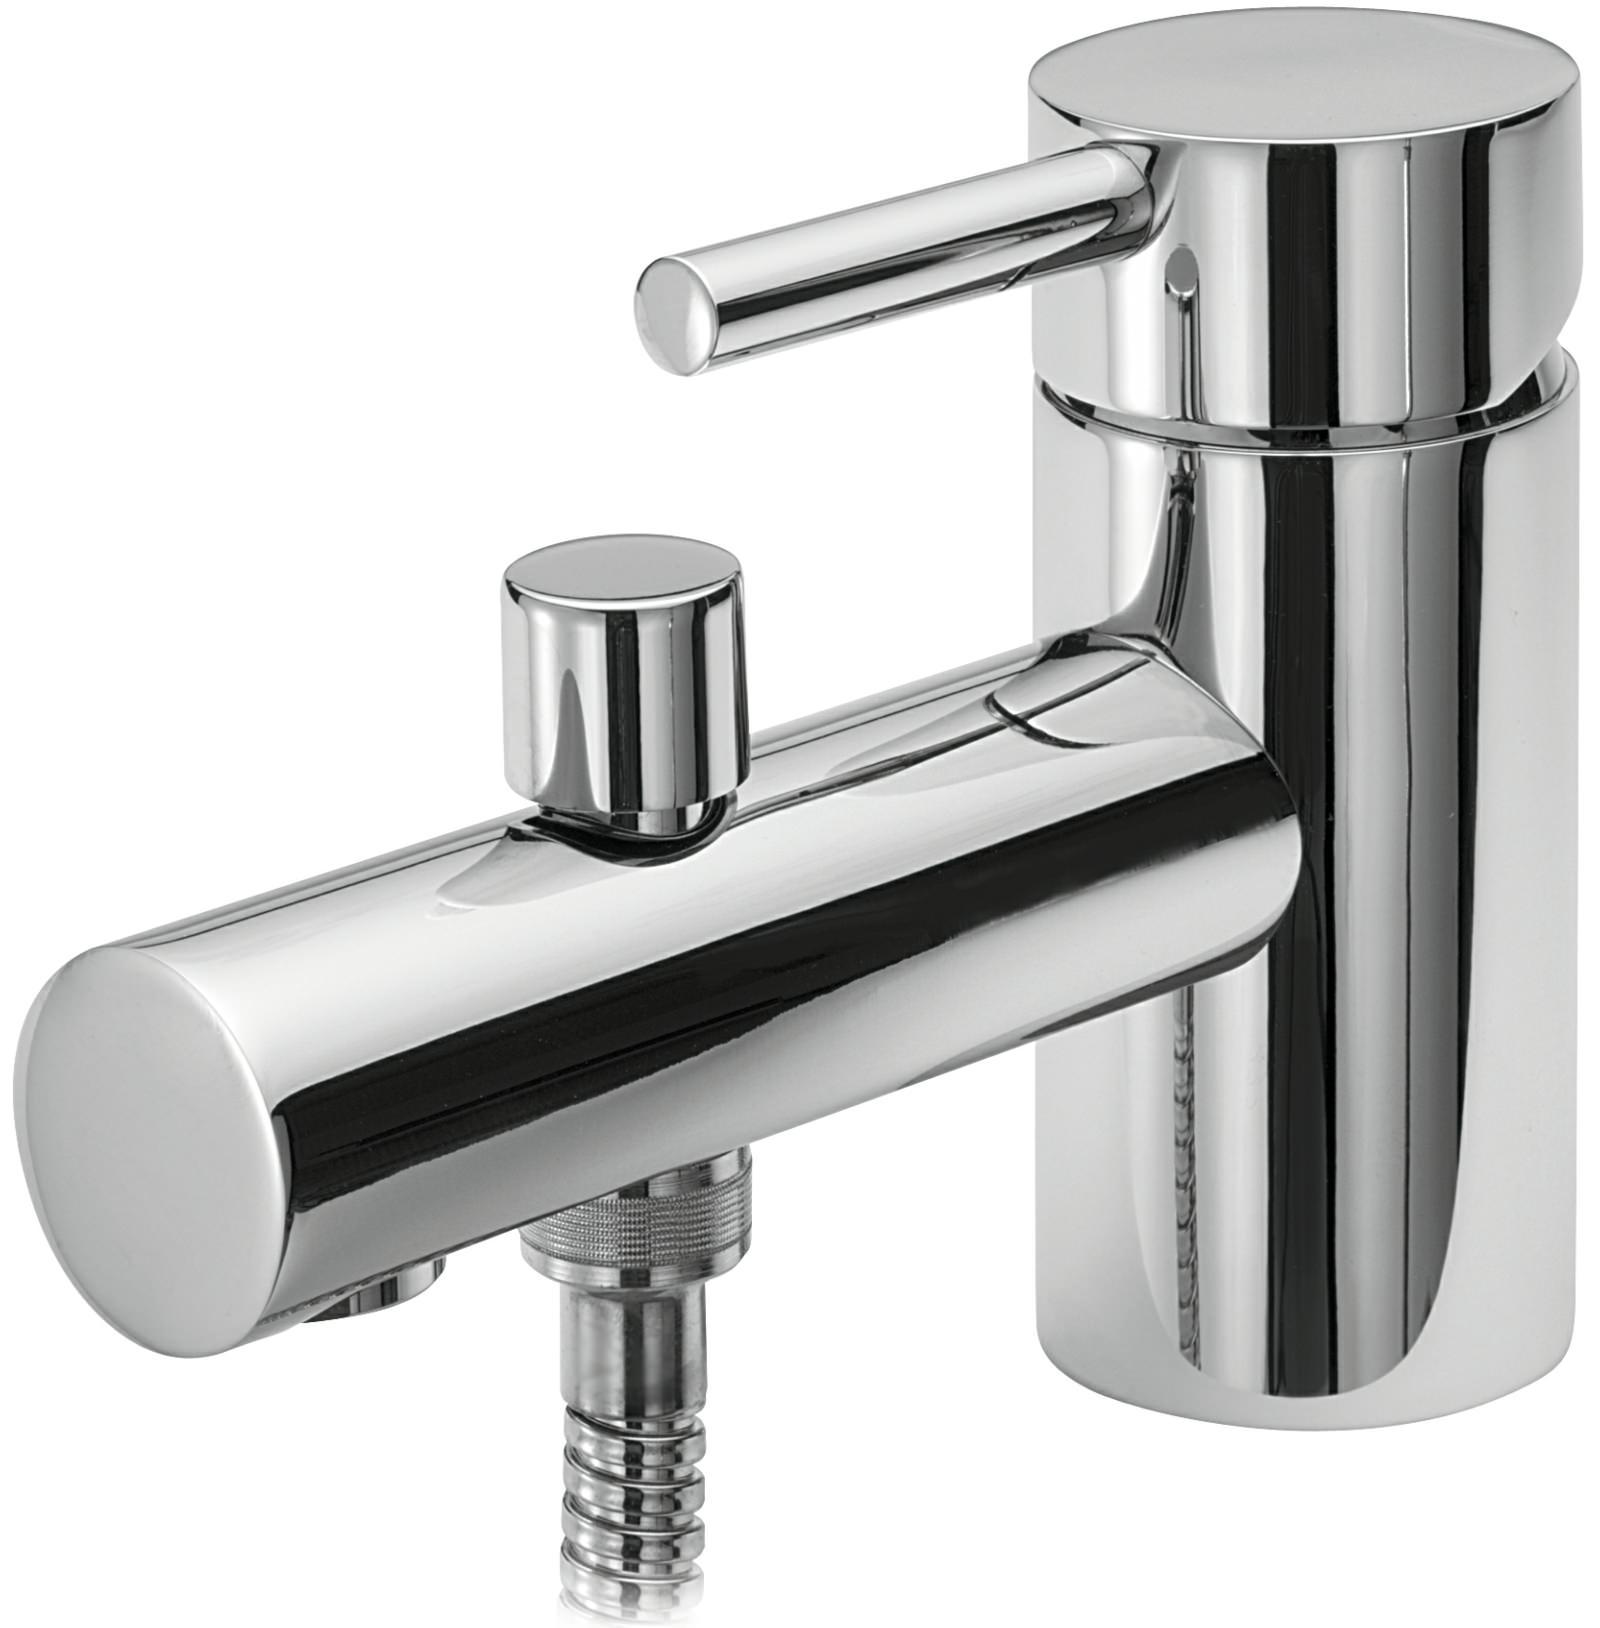 sagittarius piazza monobloc bath shower mixer tap and kit. Black Bedroom Furniture Sets. Home Design Ideas